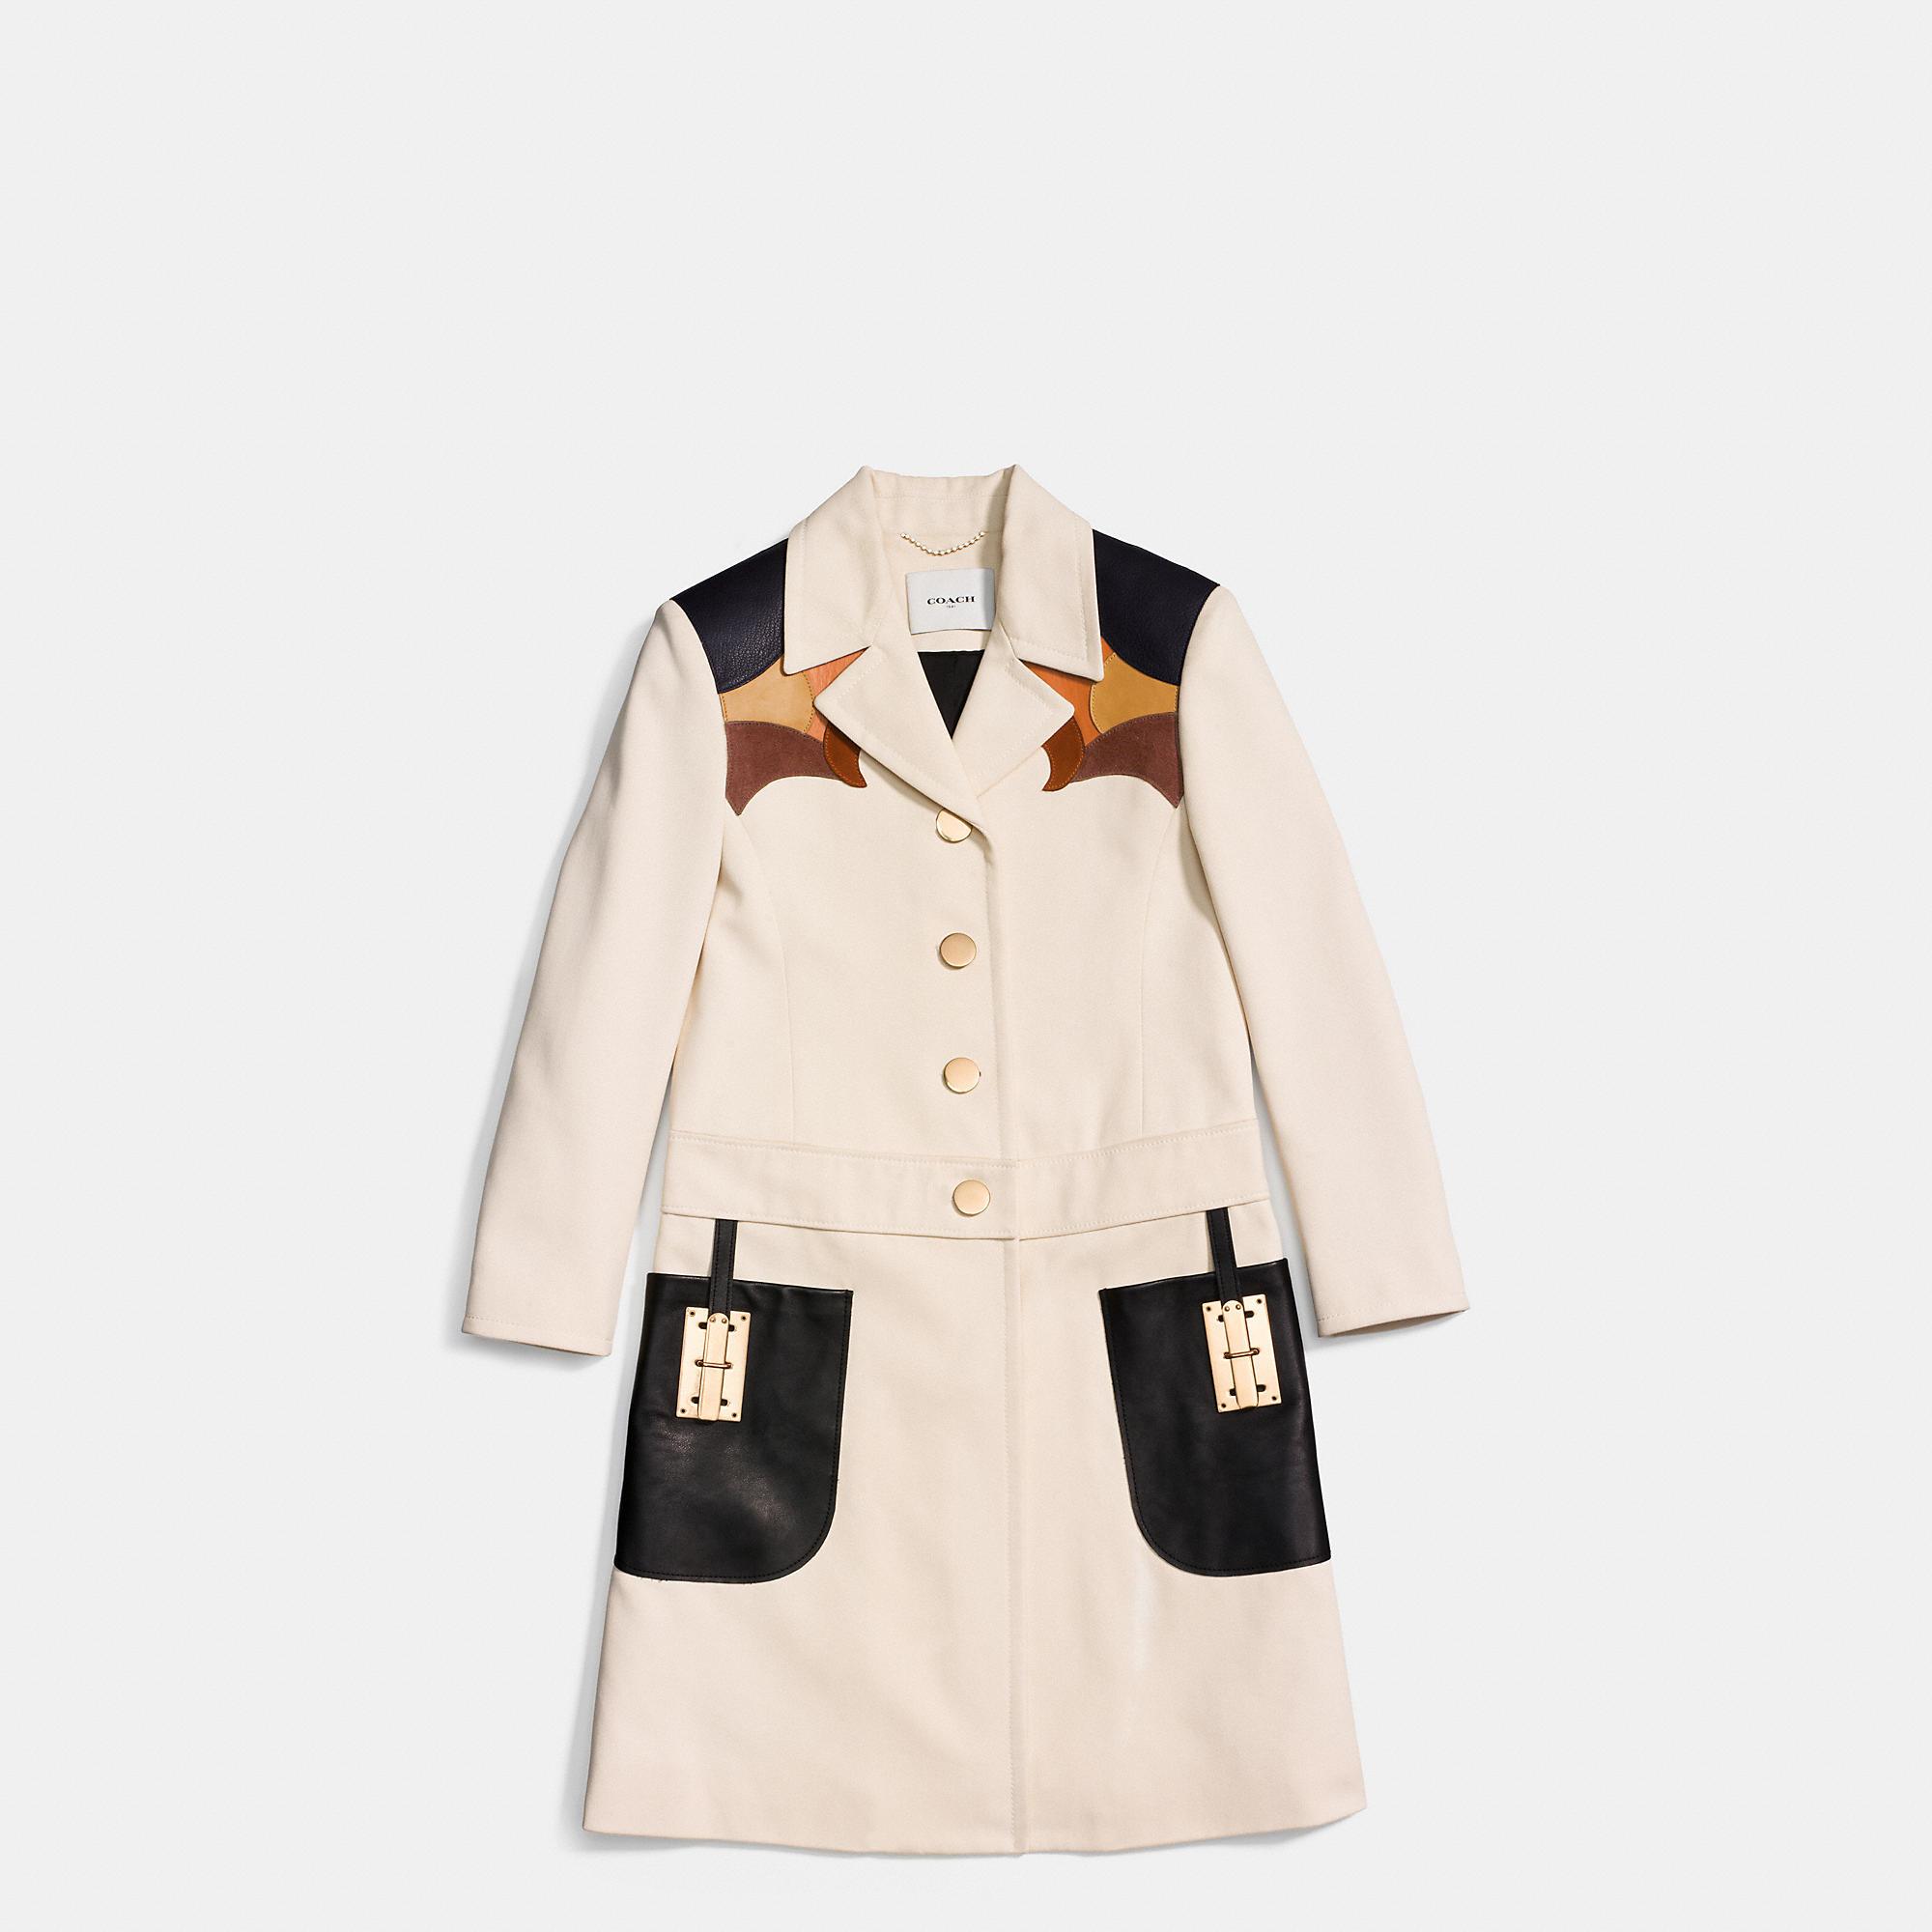 coach-beige-calico-coat-product-1-887904